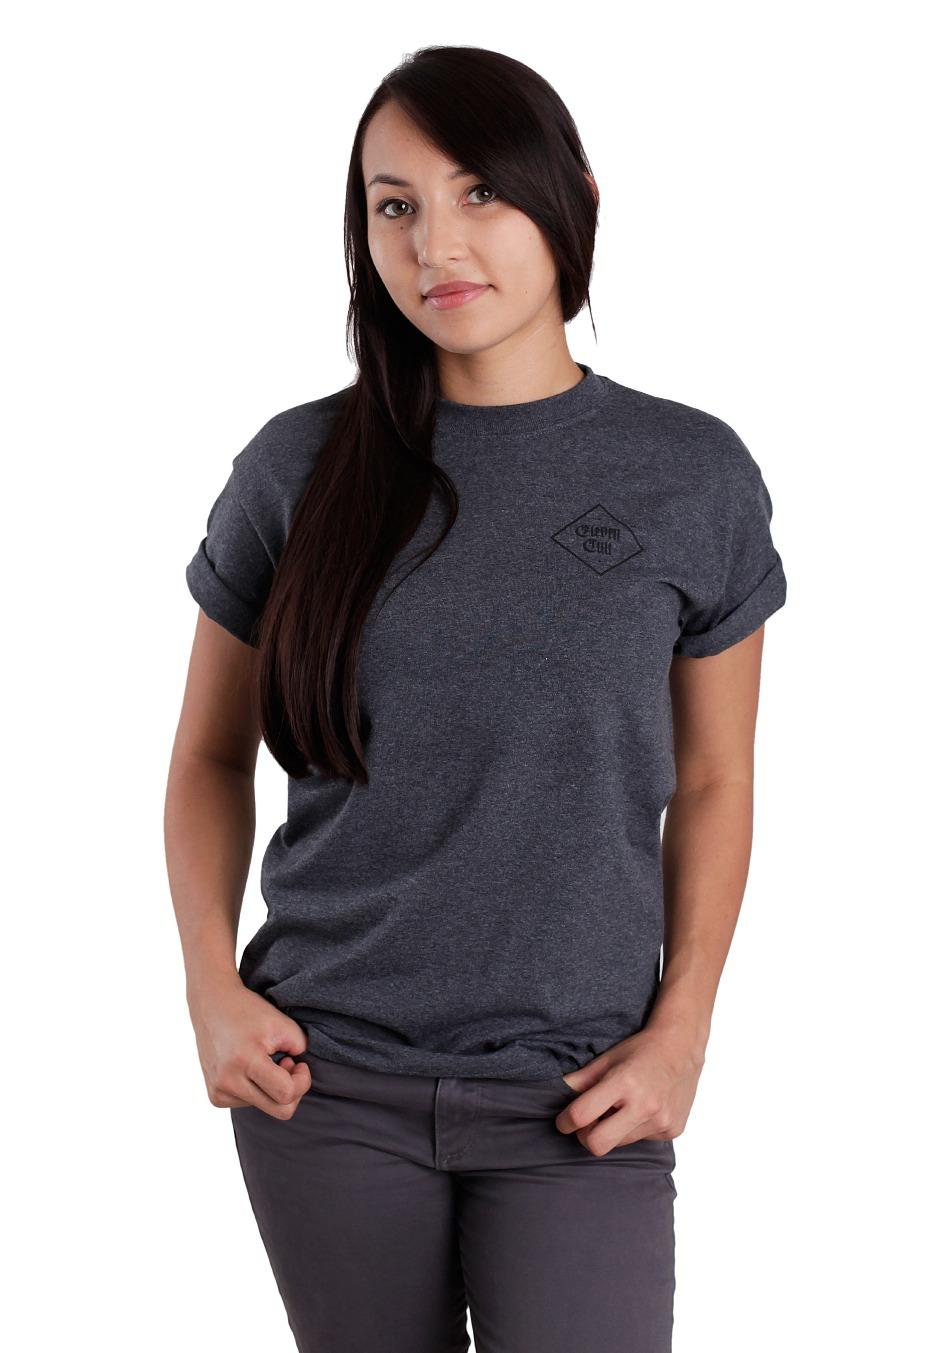 Elevencult 11 Dark Heather Grey T Shirt Streetwear